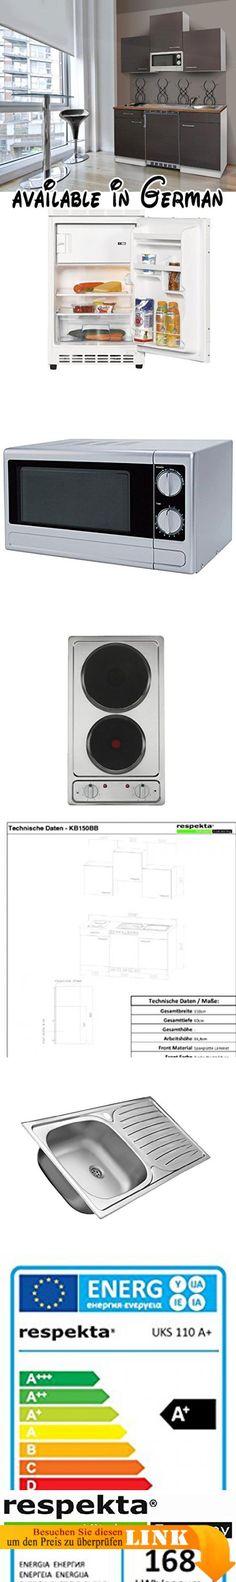 B00FIMB8J2  respekta Küchenblock 150 cm weiß grau mit APL Butcher - küchenblock 260 cm